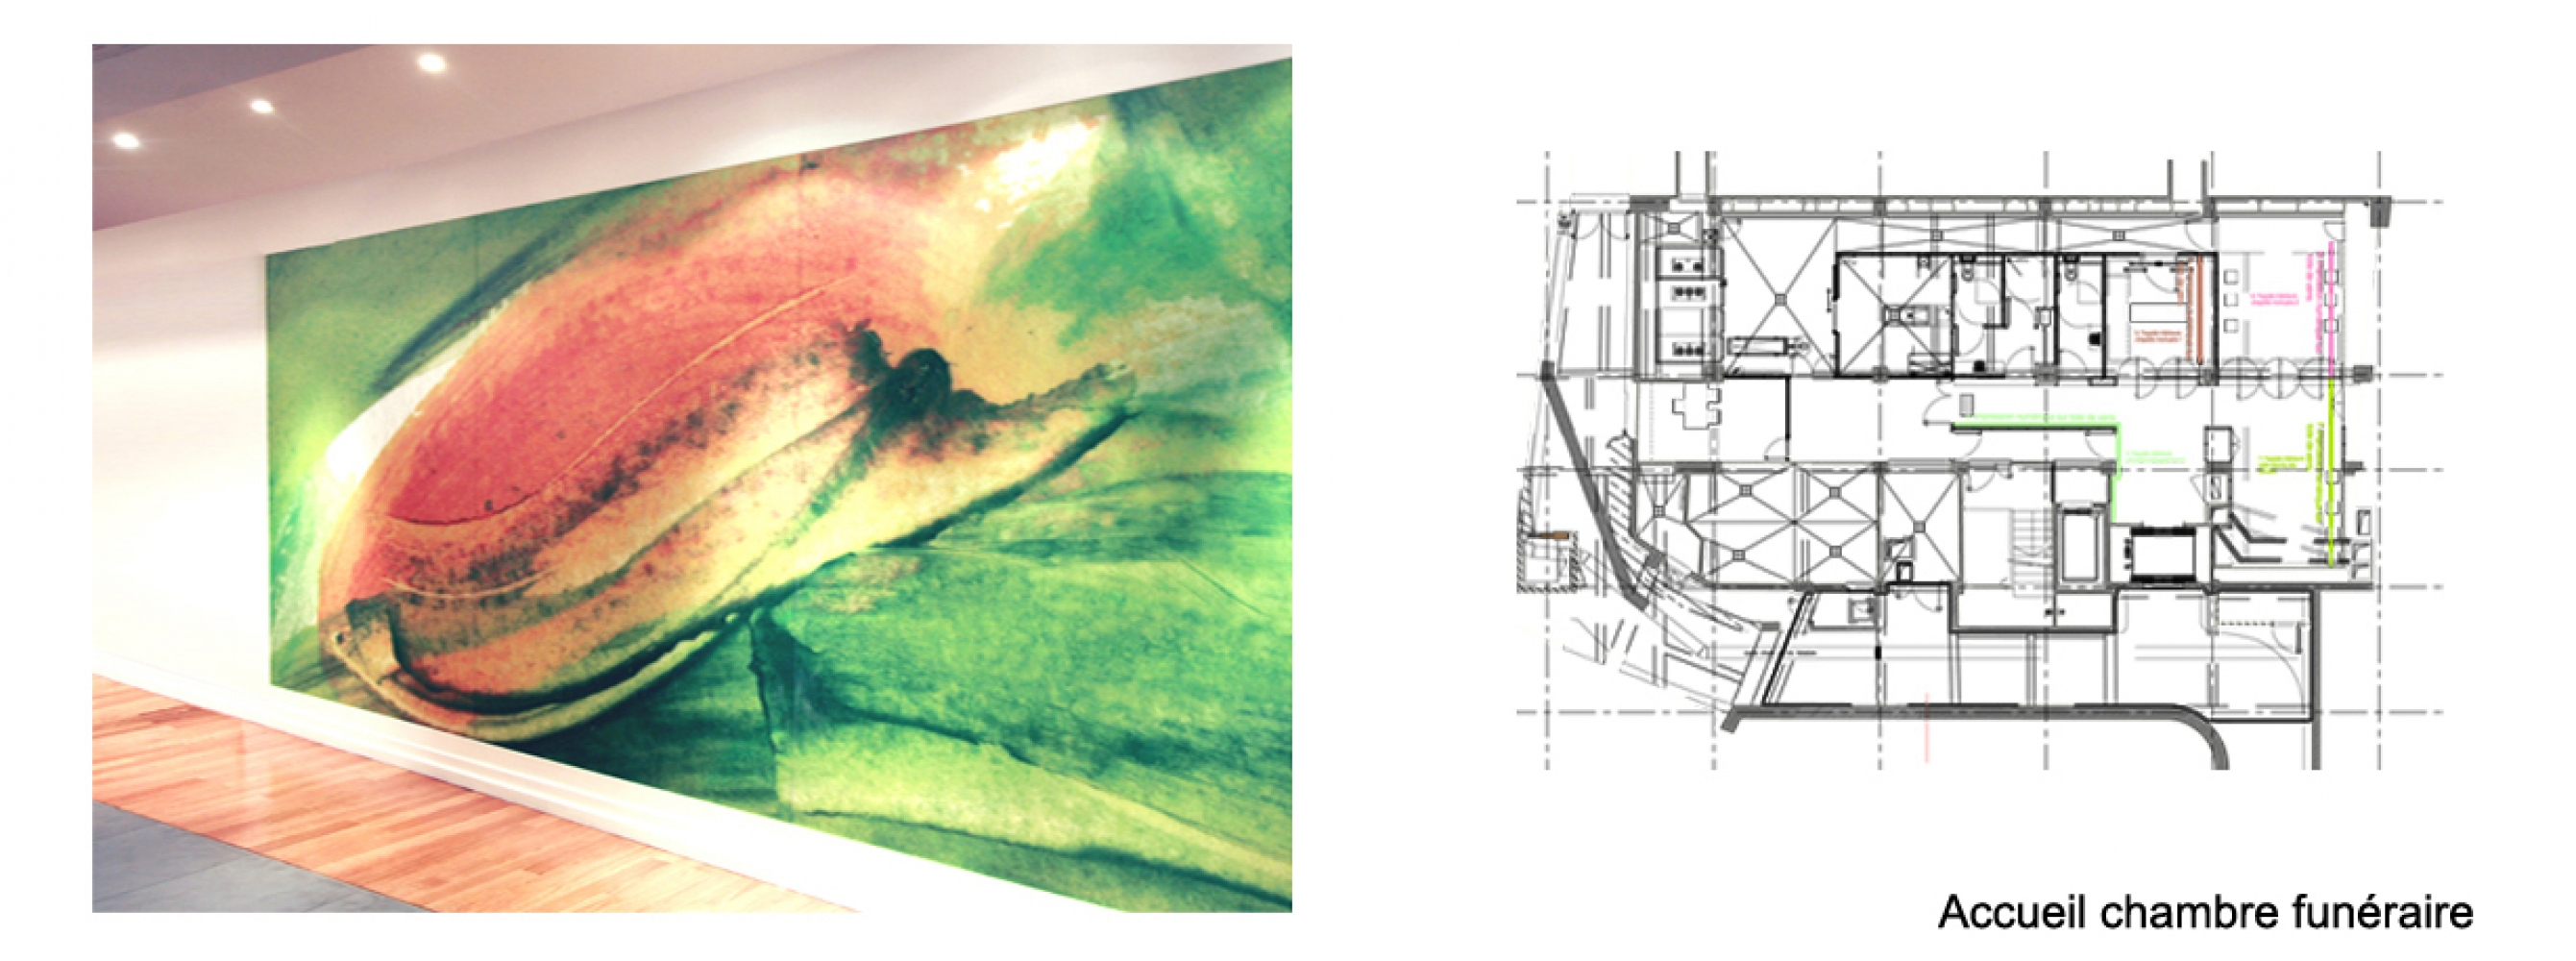 curie02 Pascale SEURIN Architecte - Pascale SEURIN Architecte